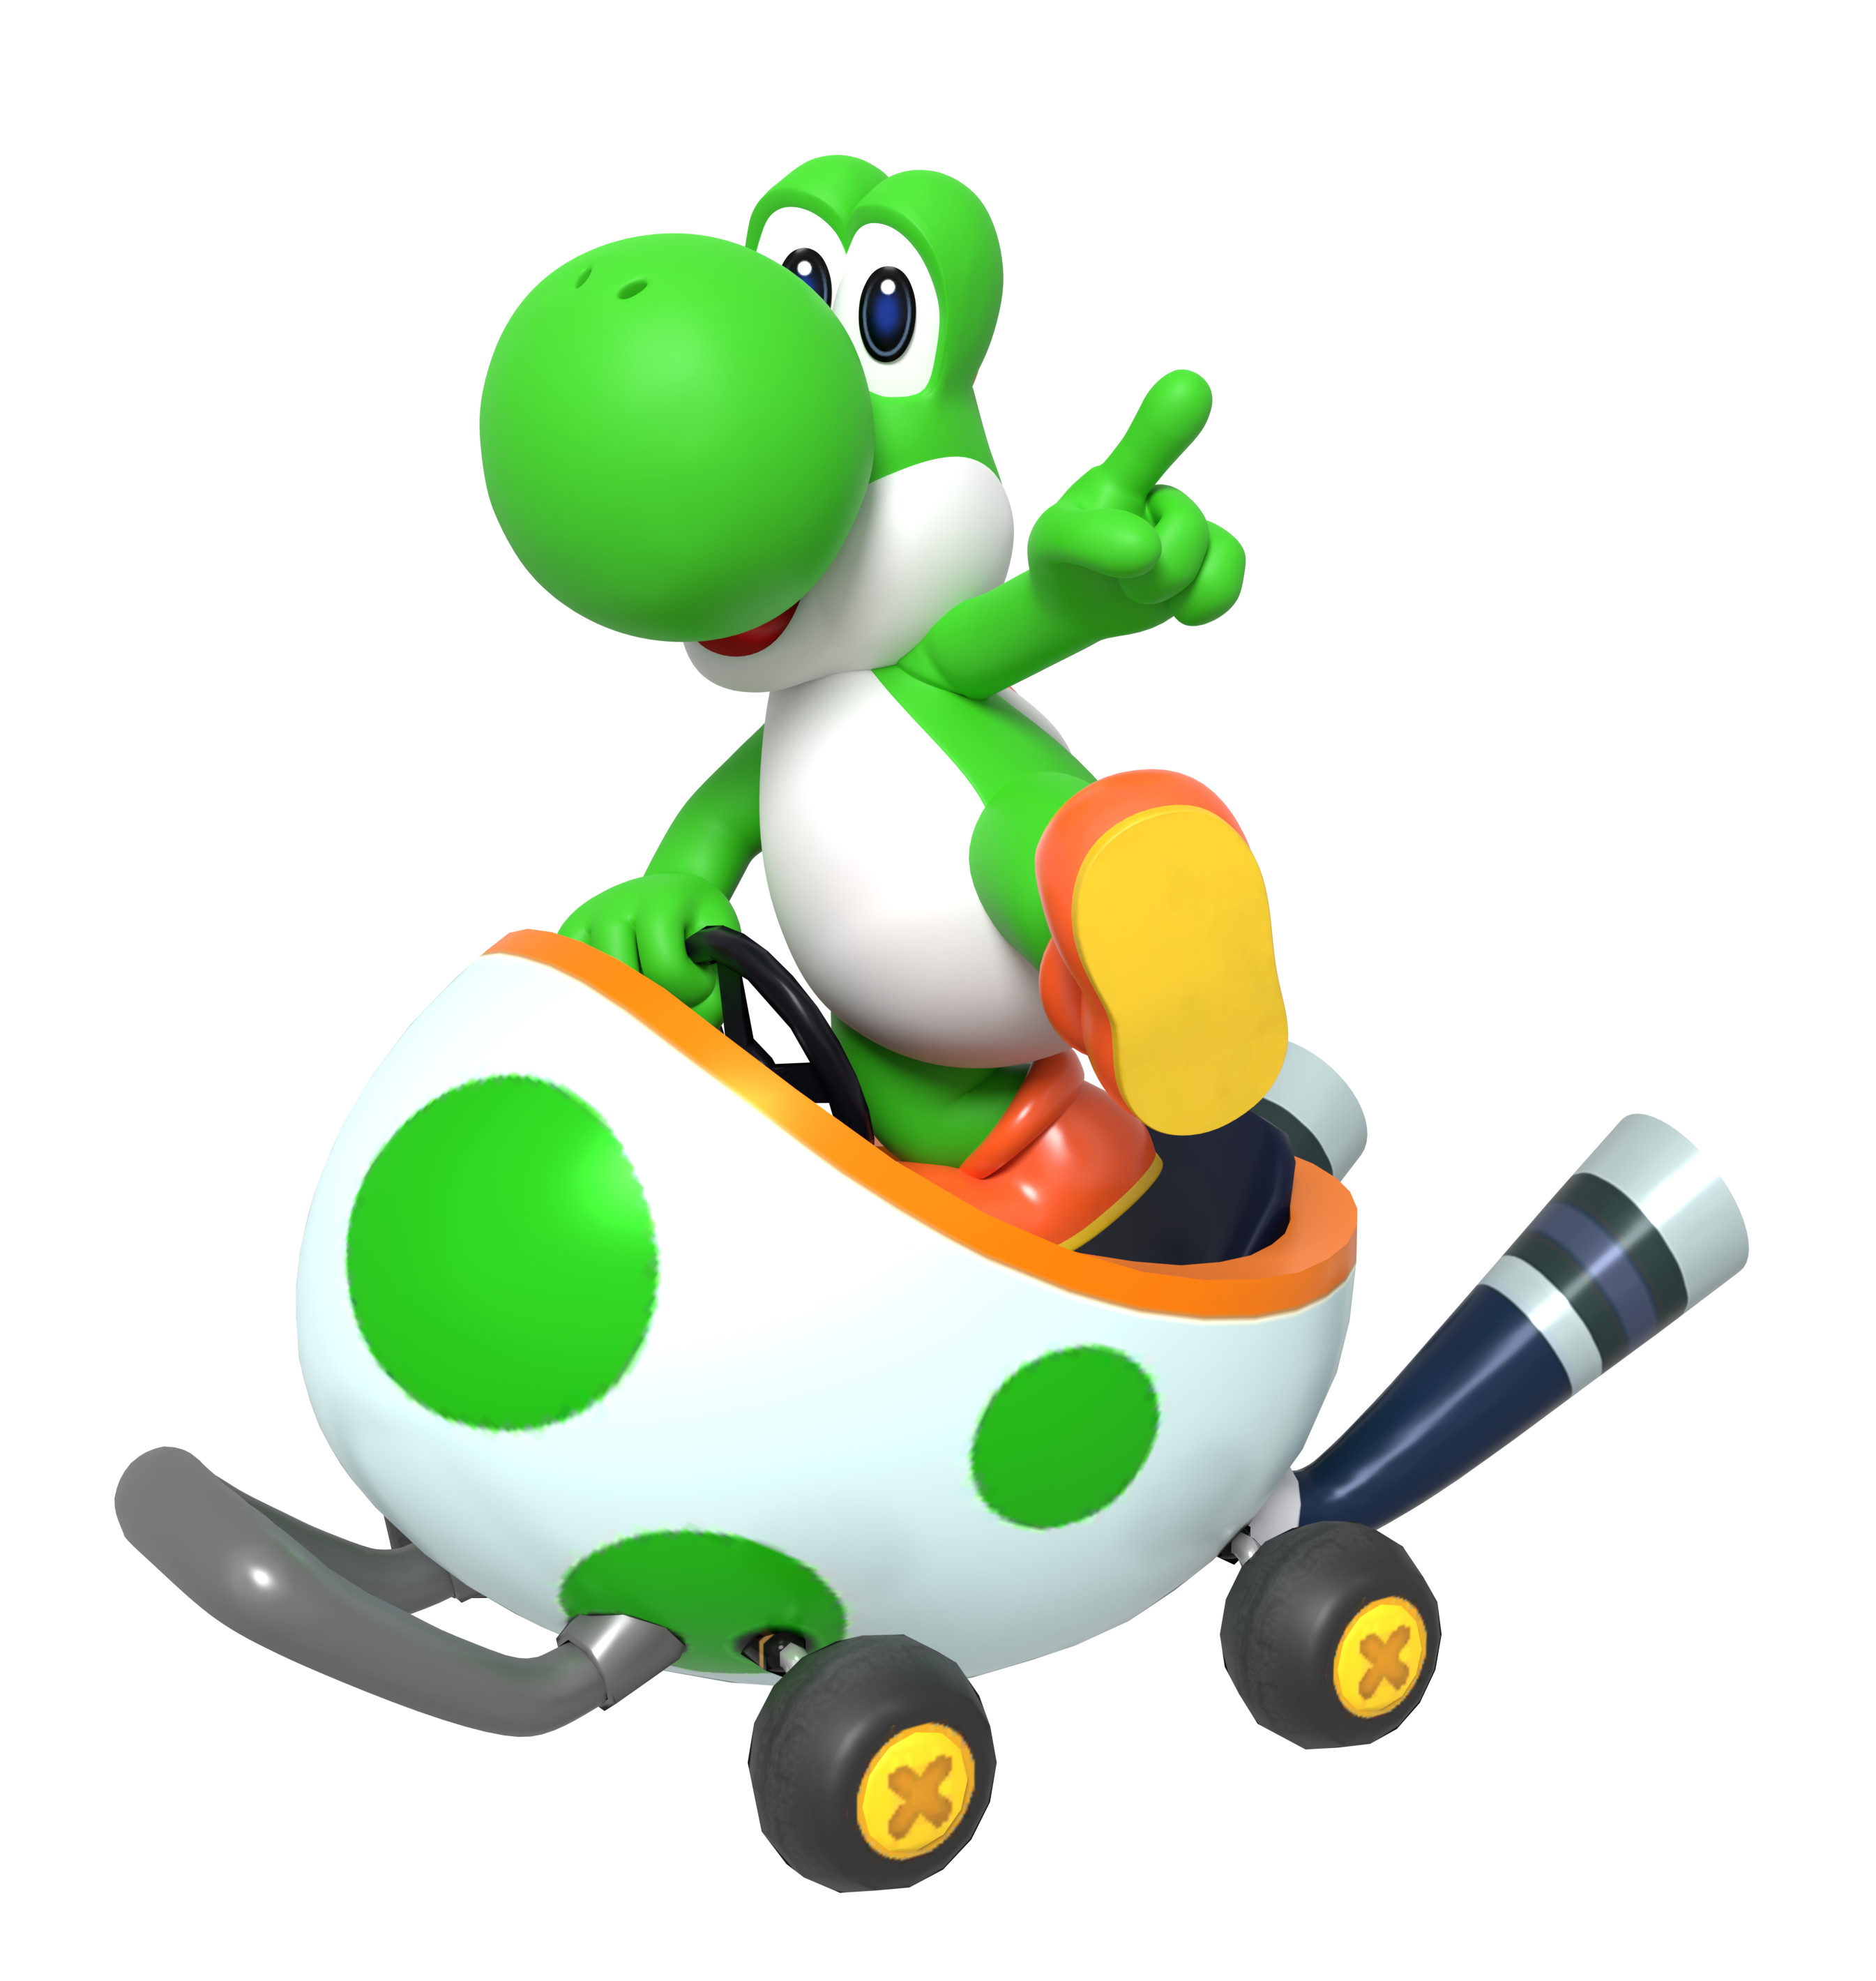 Yoshi Kart Tour Render By Nintega Dario On Deviantart Super Mario Bros Party Mario Kart Characters Mario Bros Party